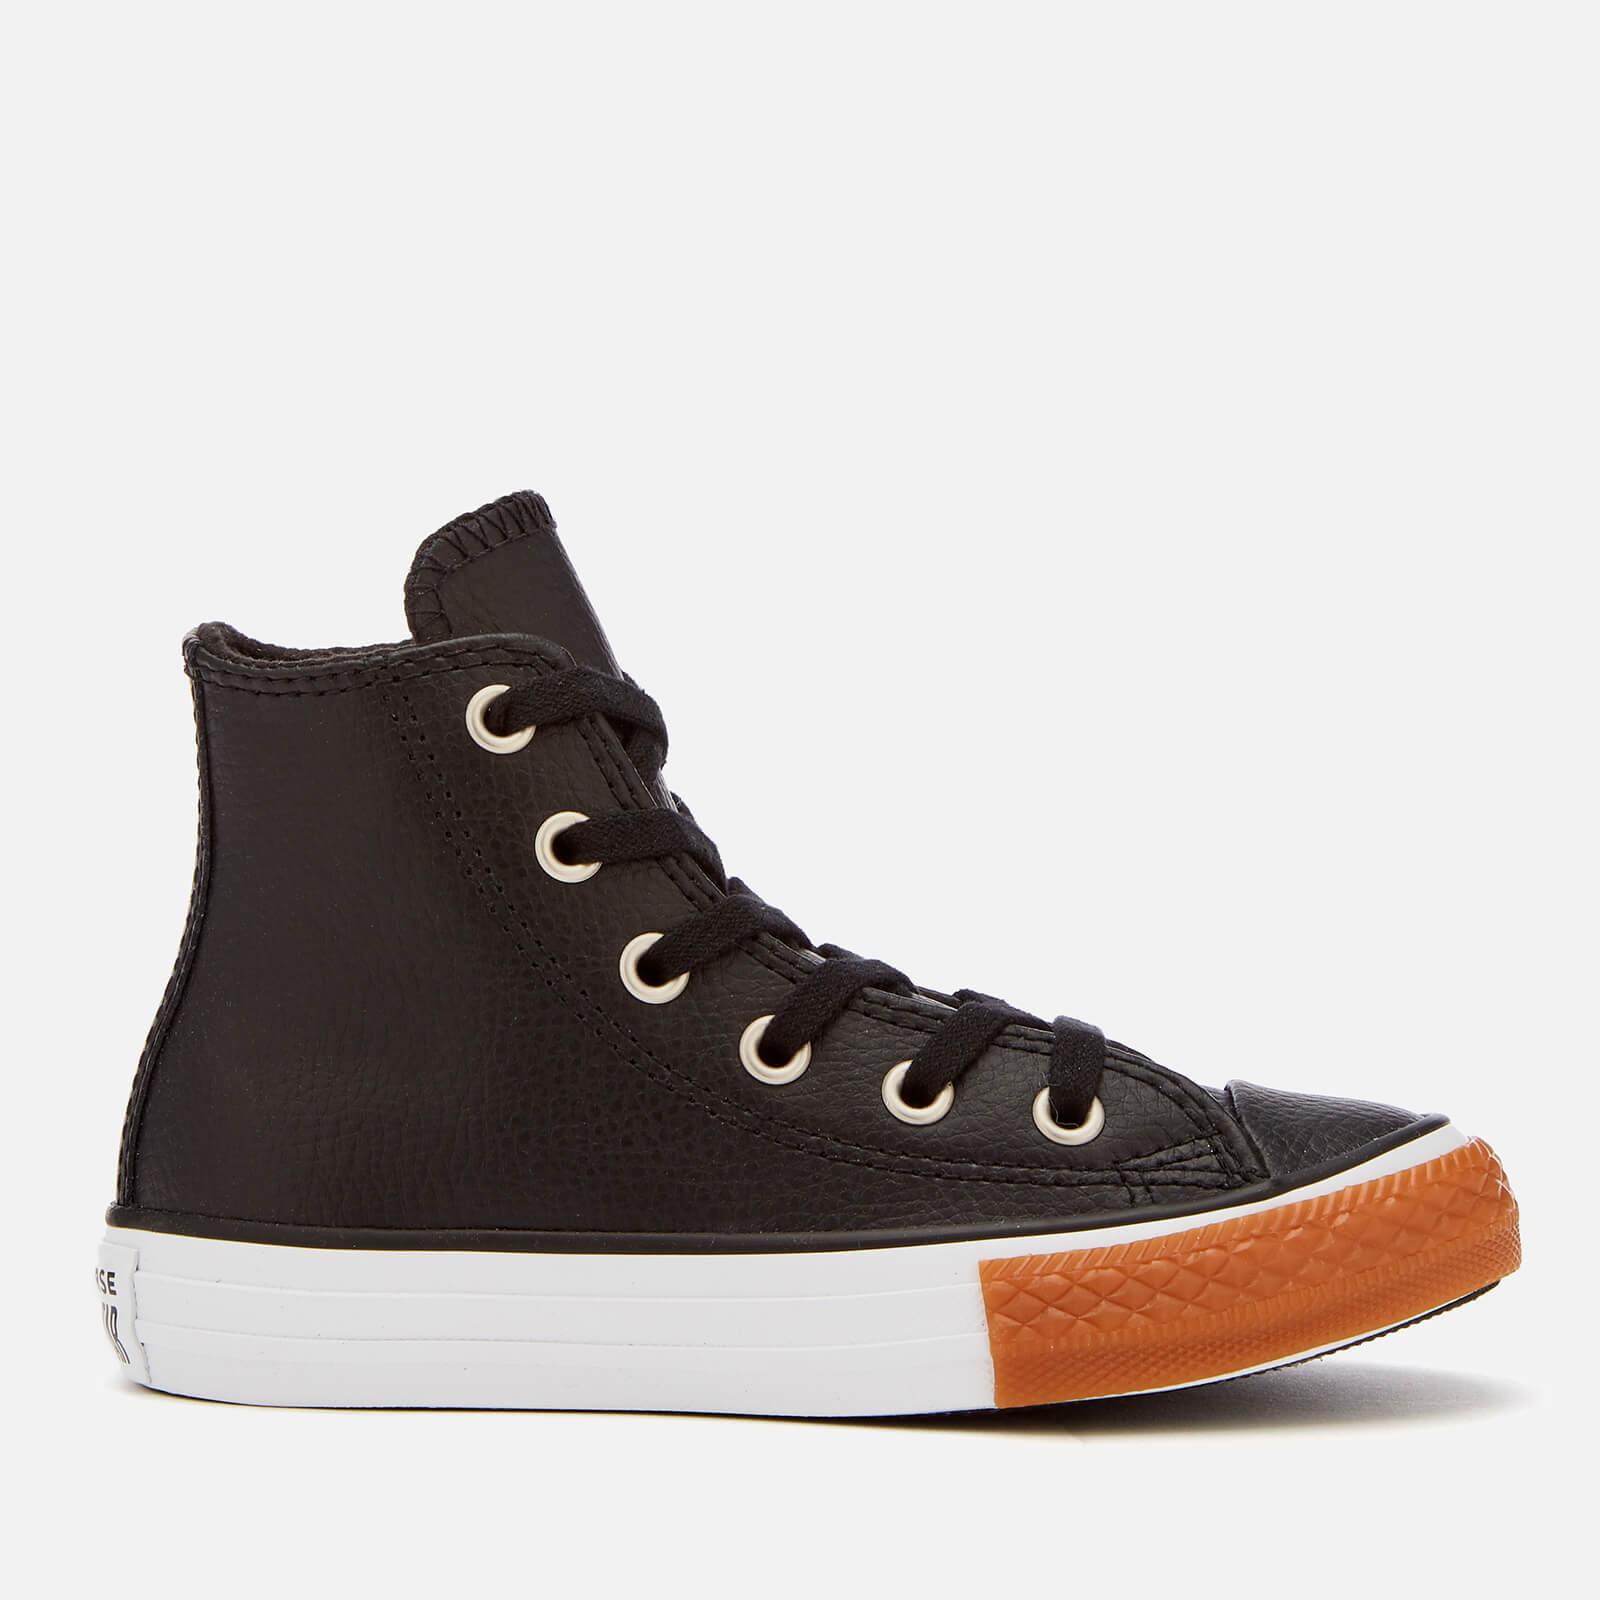 c36005488d41 Converse Kids  Chuck Taylor All Star Hi-Top Trainers - Black White Gum  Honey Junior Clothing